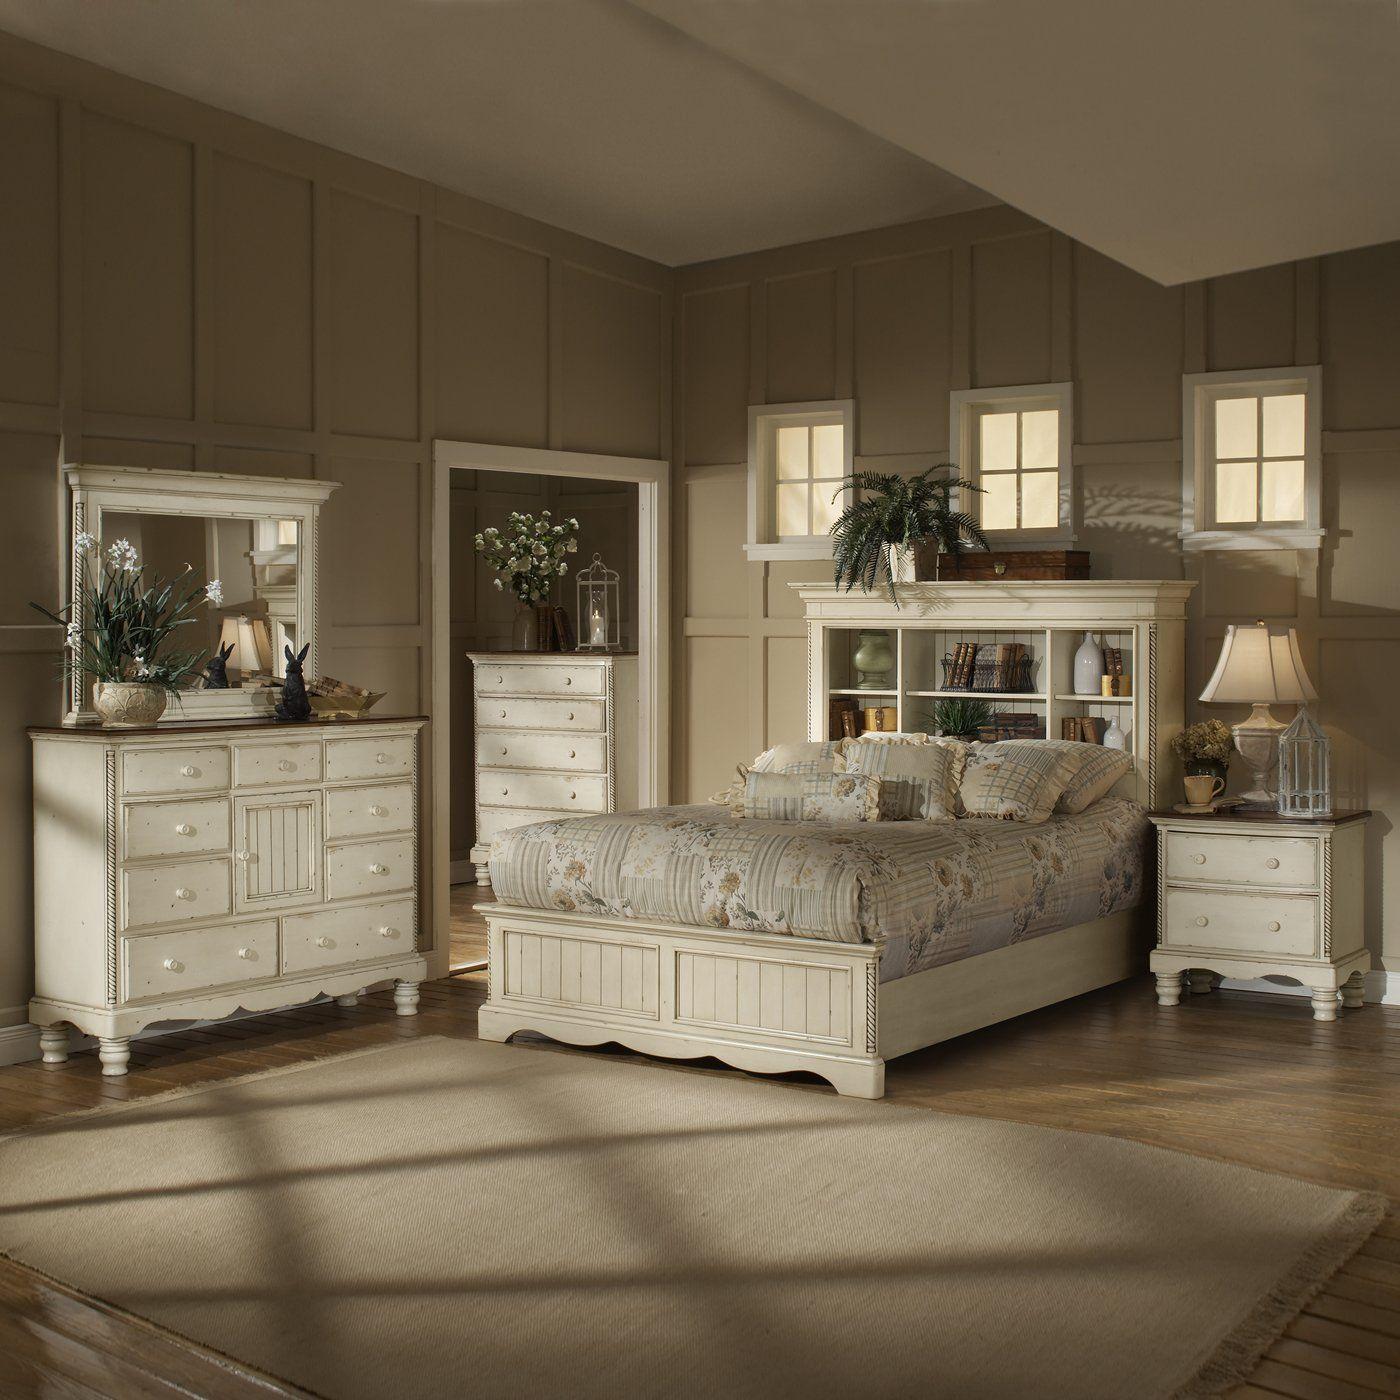 Hillsdale Furniture 1172 Wilshire Bookcase Headboard